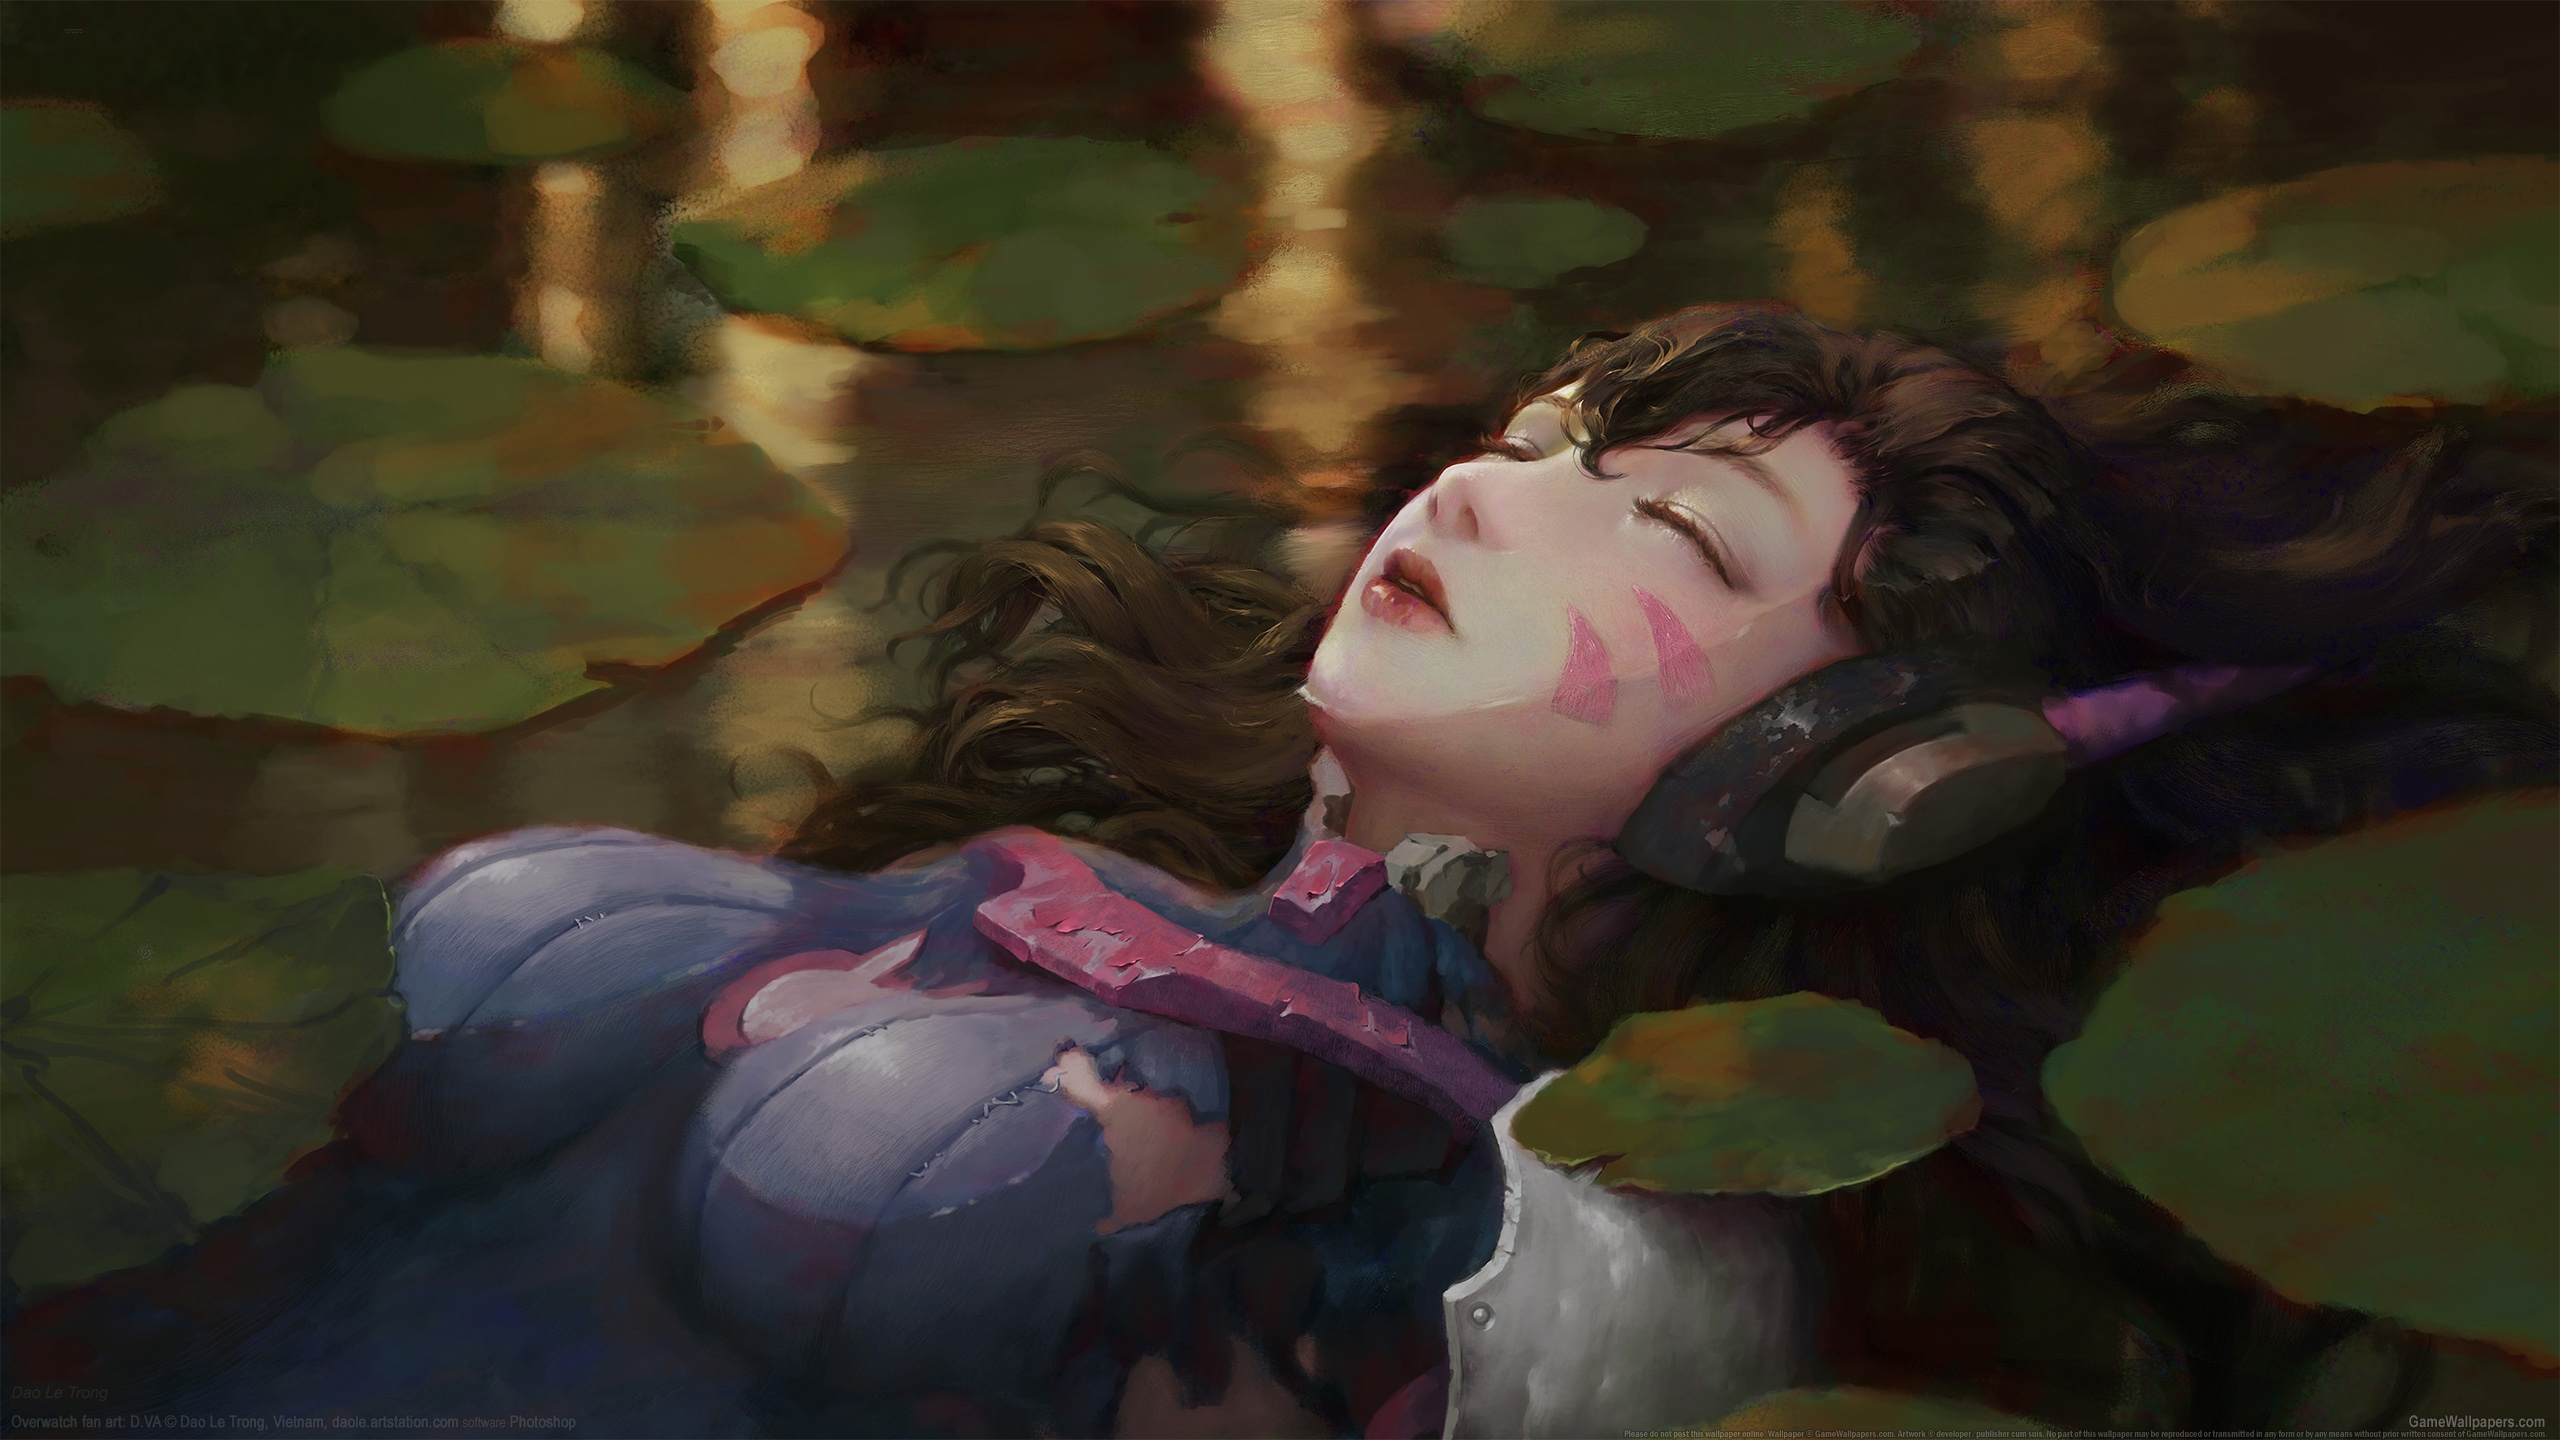 Overwatch fan art 2560x1440 Hintergrundbild 02